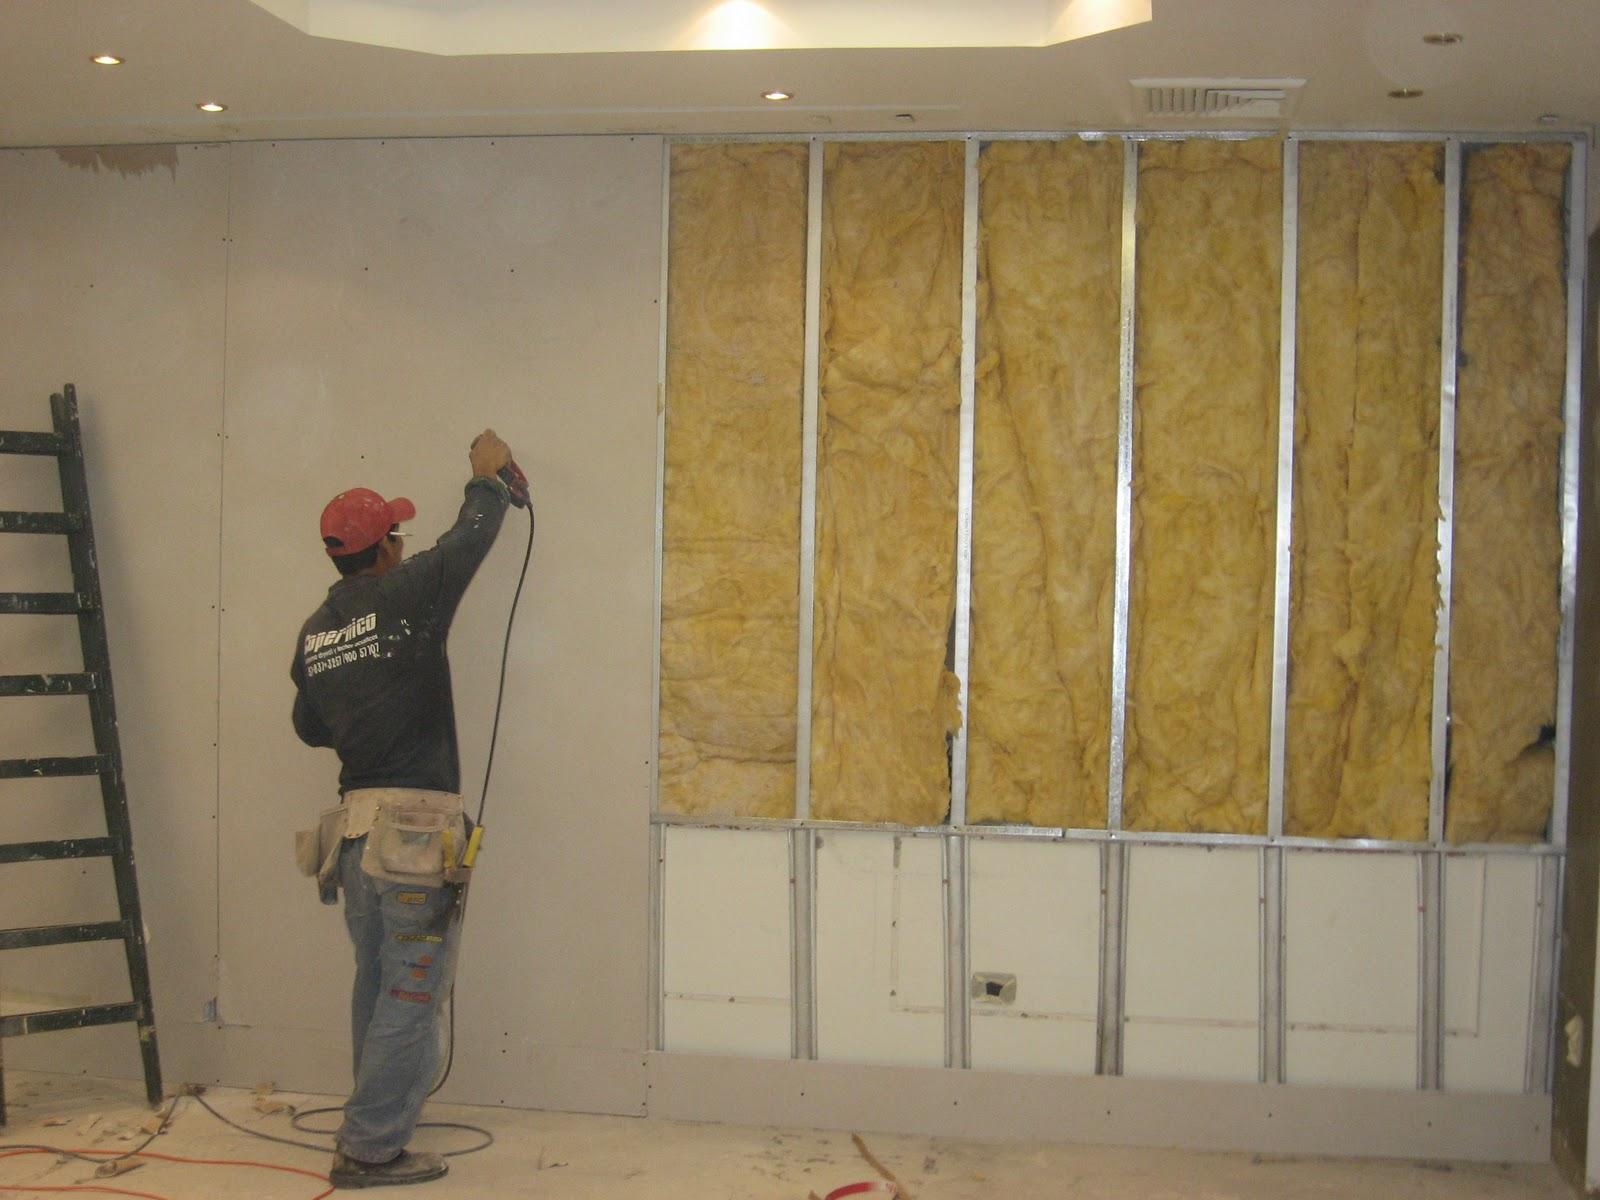 Vidrios espejos toberin mazuren colina drywall for Figuras en draibol para sala